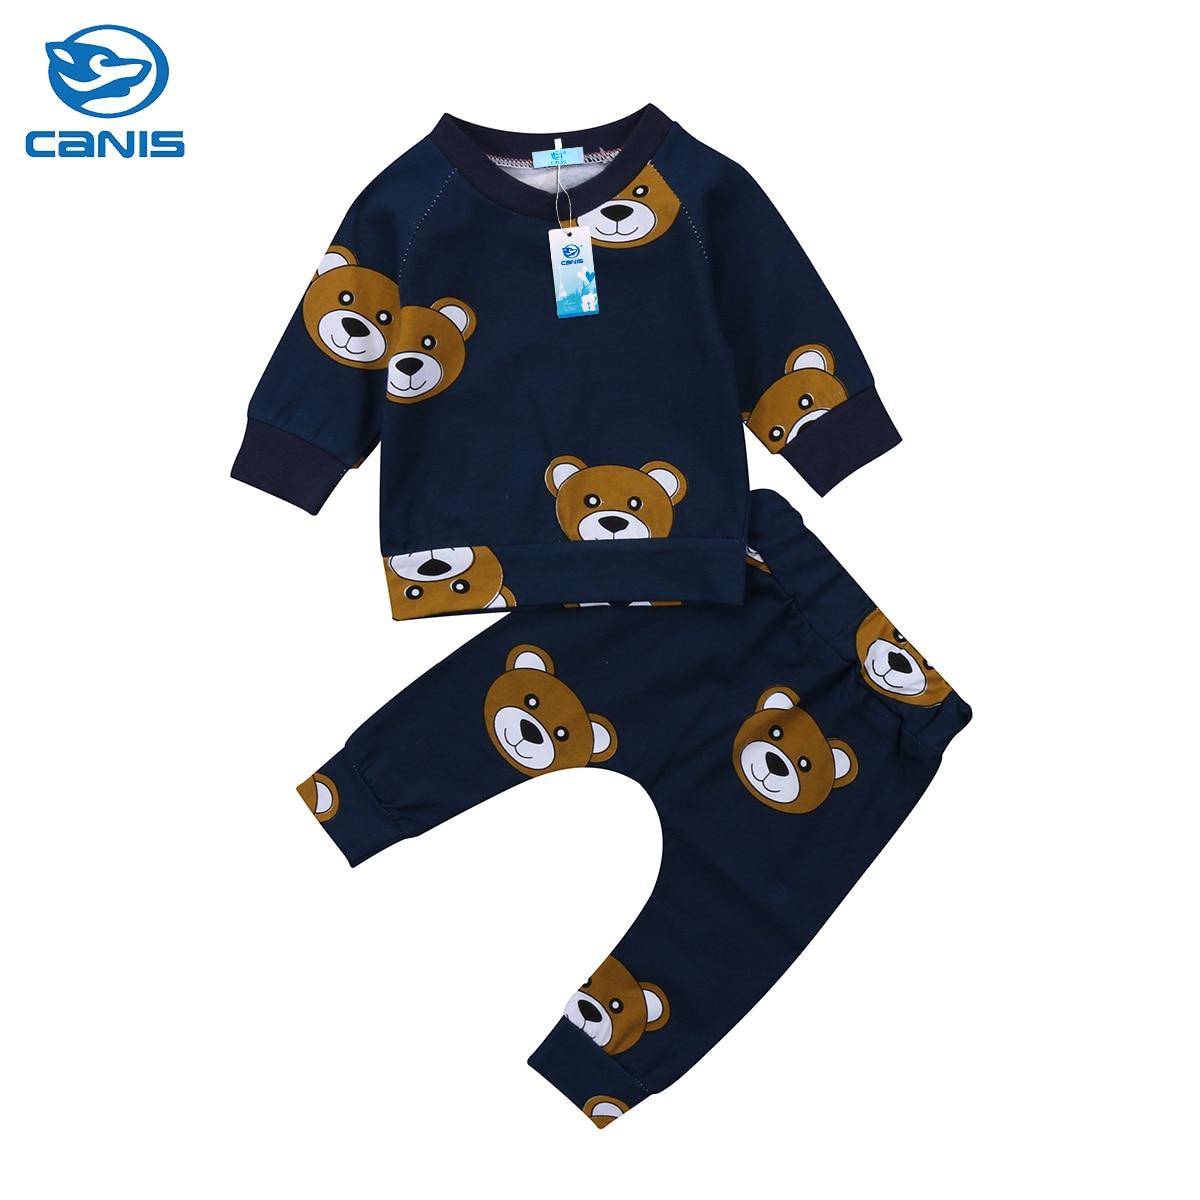 2Pcs Cute Newborn Infant Baby Boy Panda Long Sleeve T-shirt Striped Pants Outfit Clothes Set